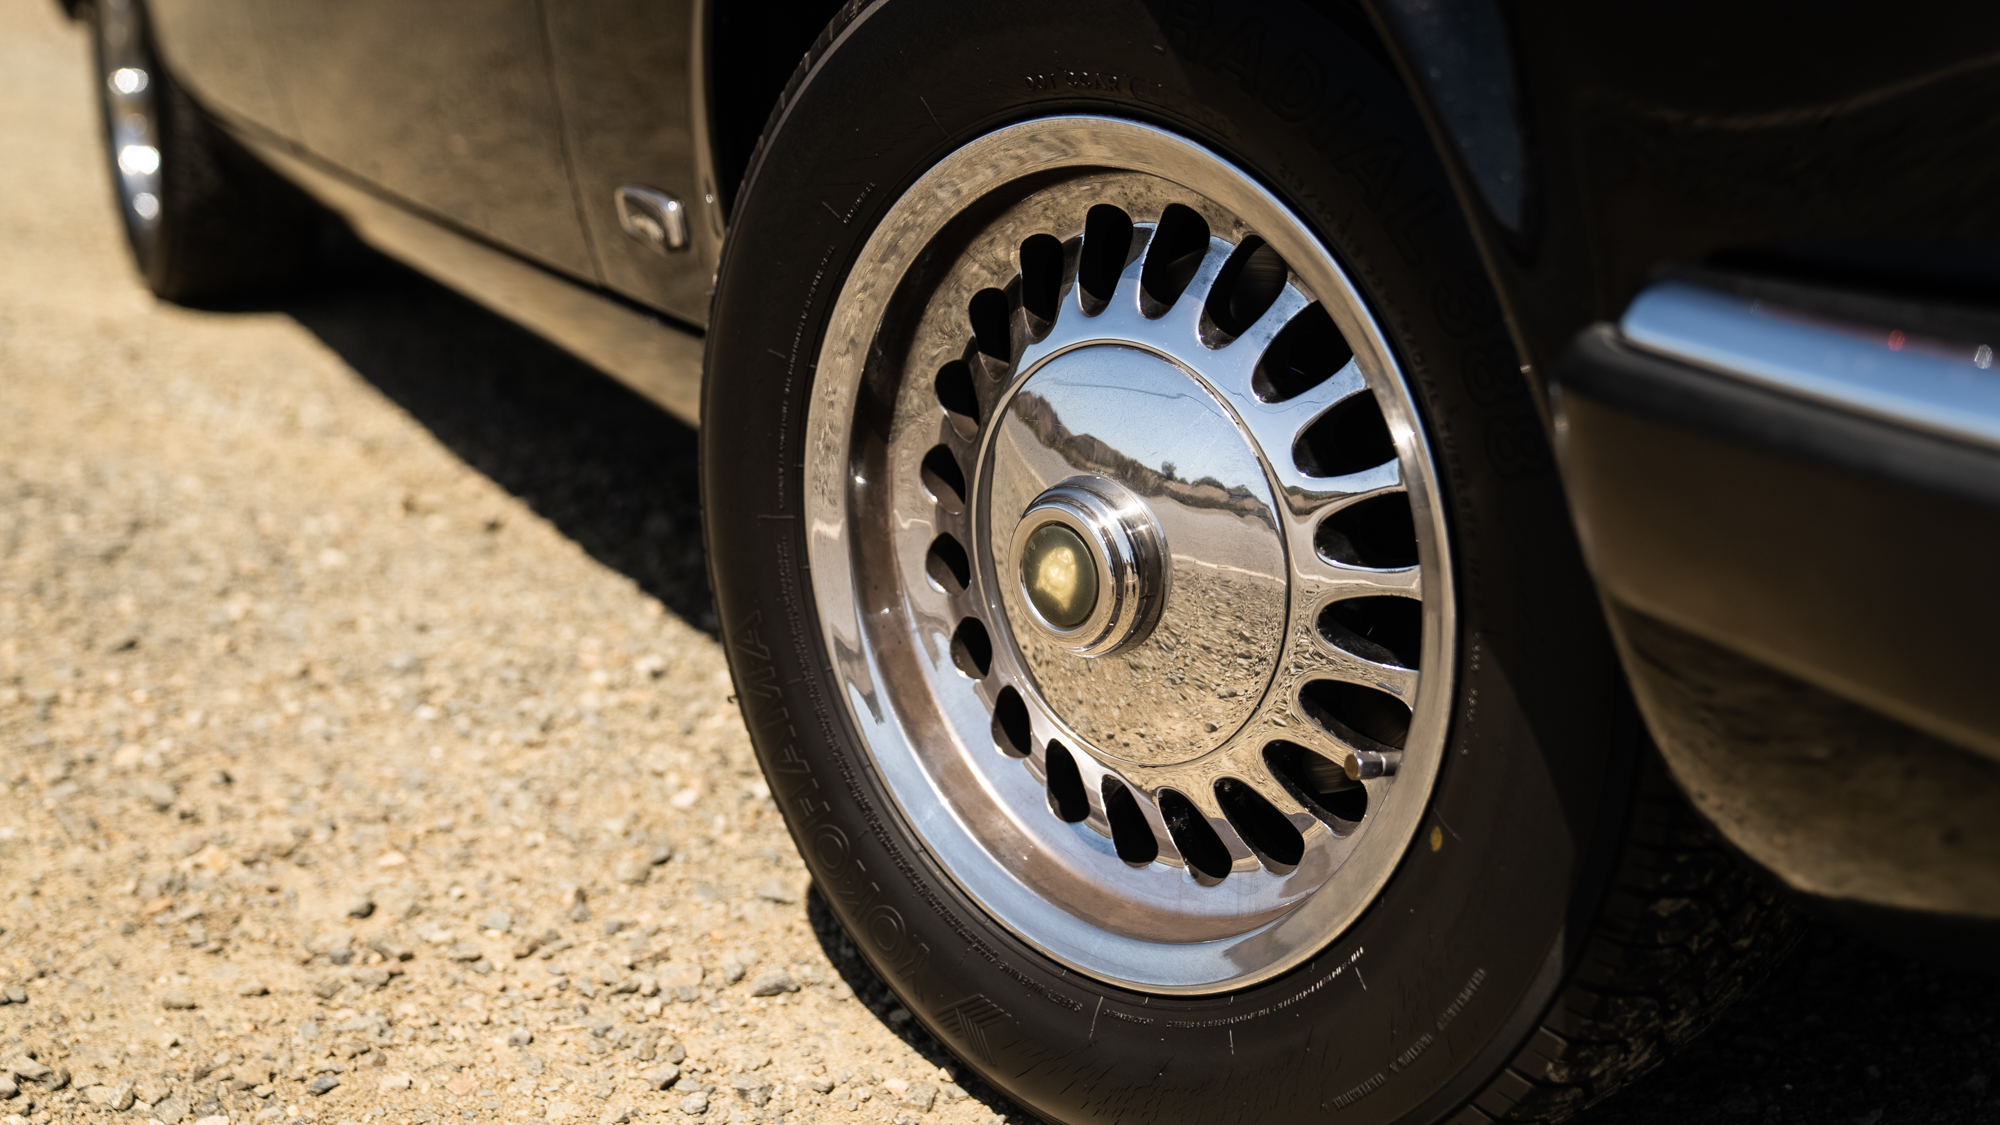 1986 Jaguar XJ6 wheels